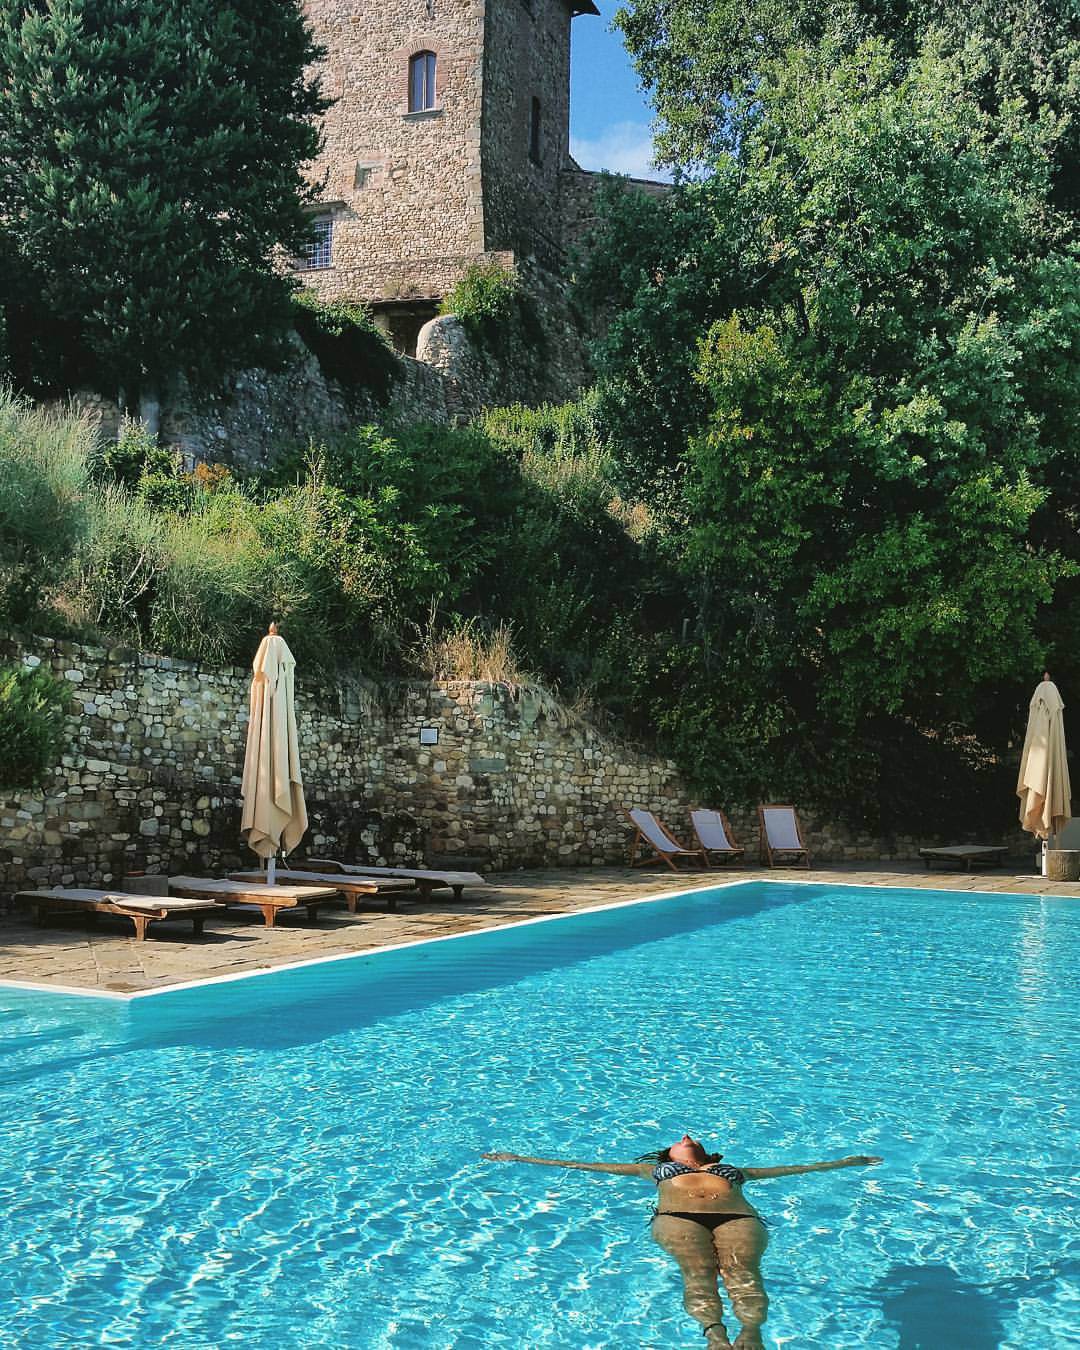 Castello-di-bibbione-tuscany-kooopswim